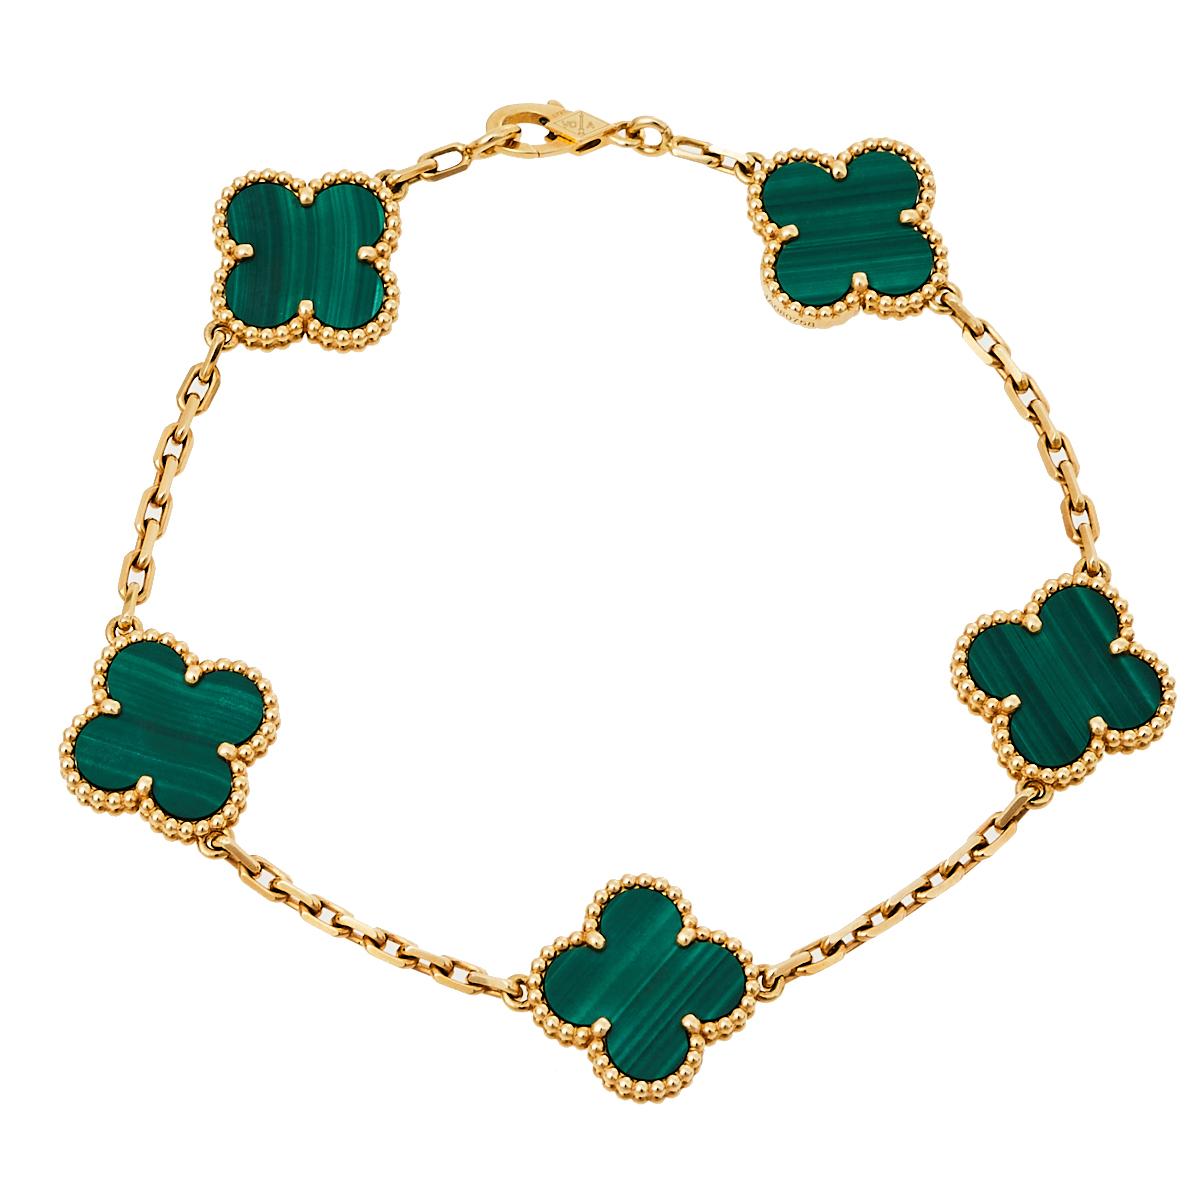 Pre-owned Van Cleef & Arpels Vintage Alhambra Malachite 18k Yellow Gold 5 Motifs Bracelet